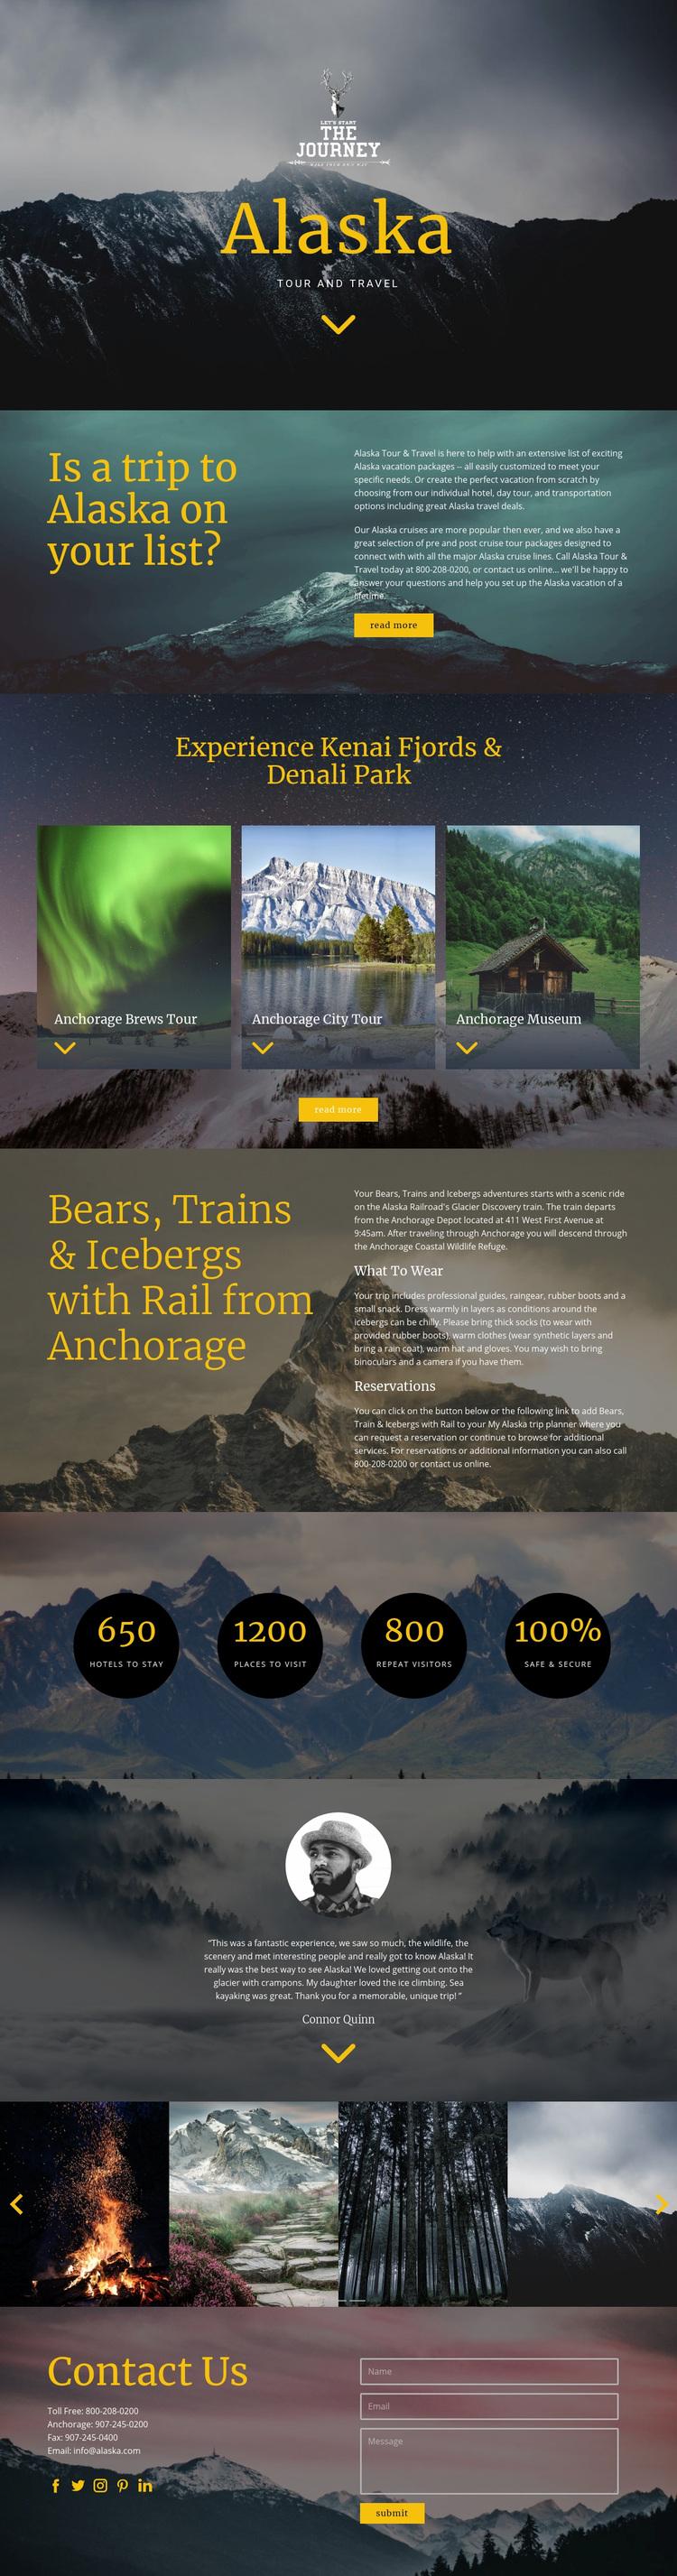 Alaska Travel Web Page Designer